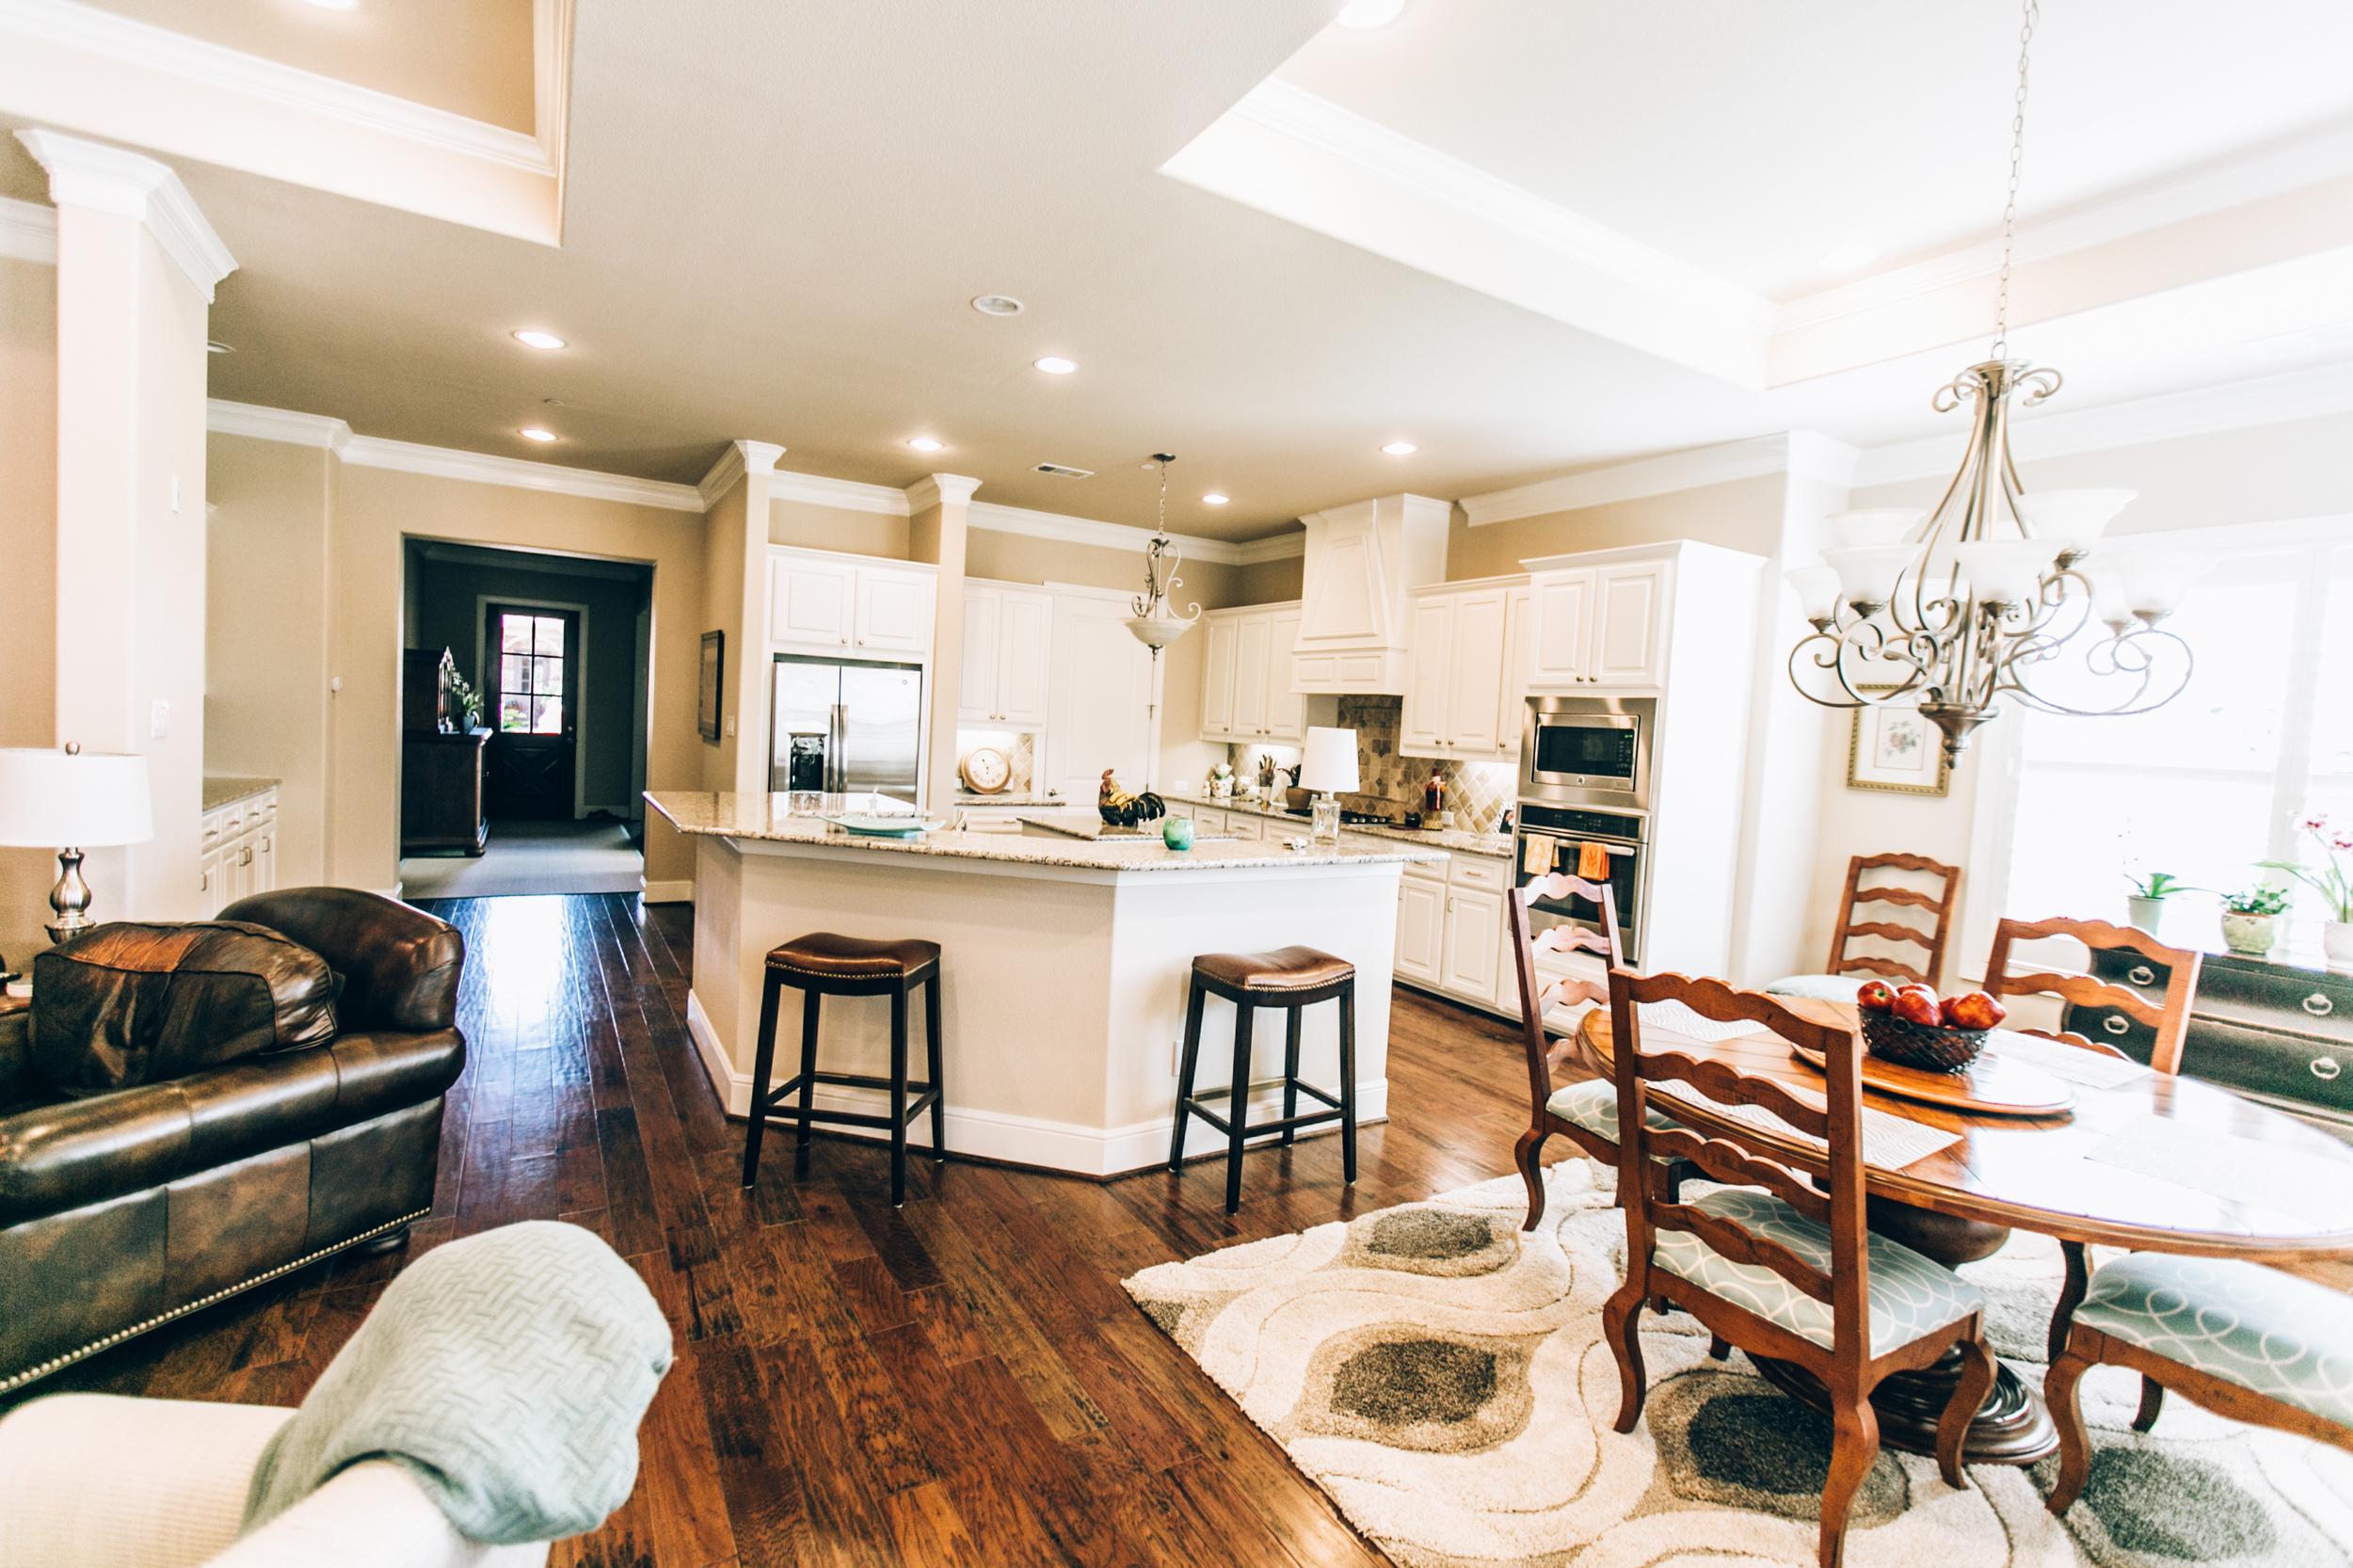 interior-design-home-decorating-332.jpg